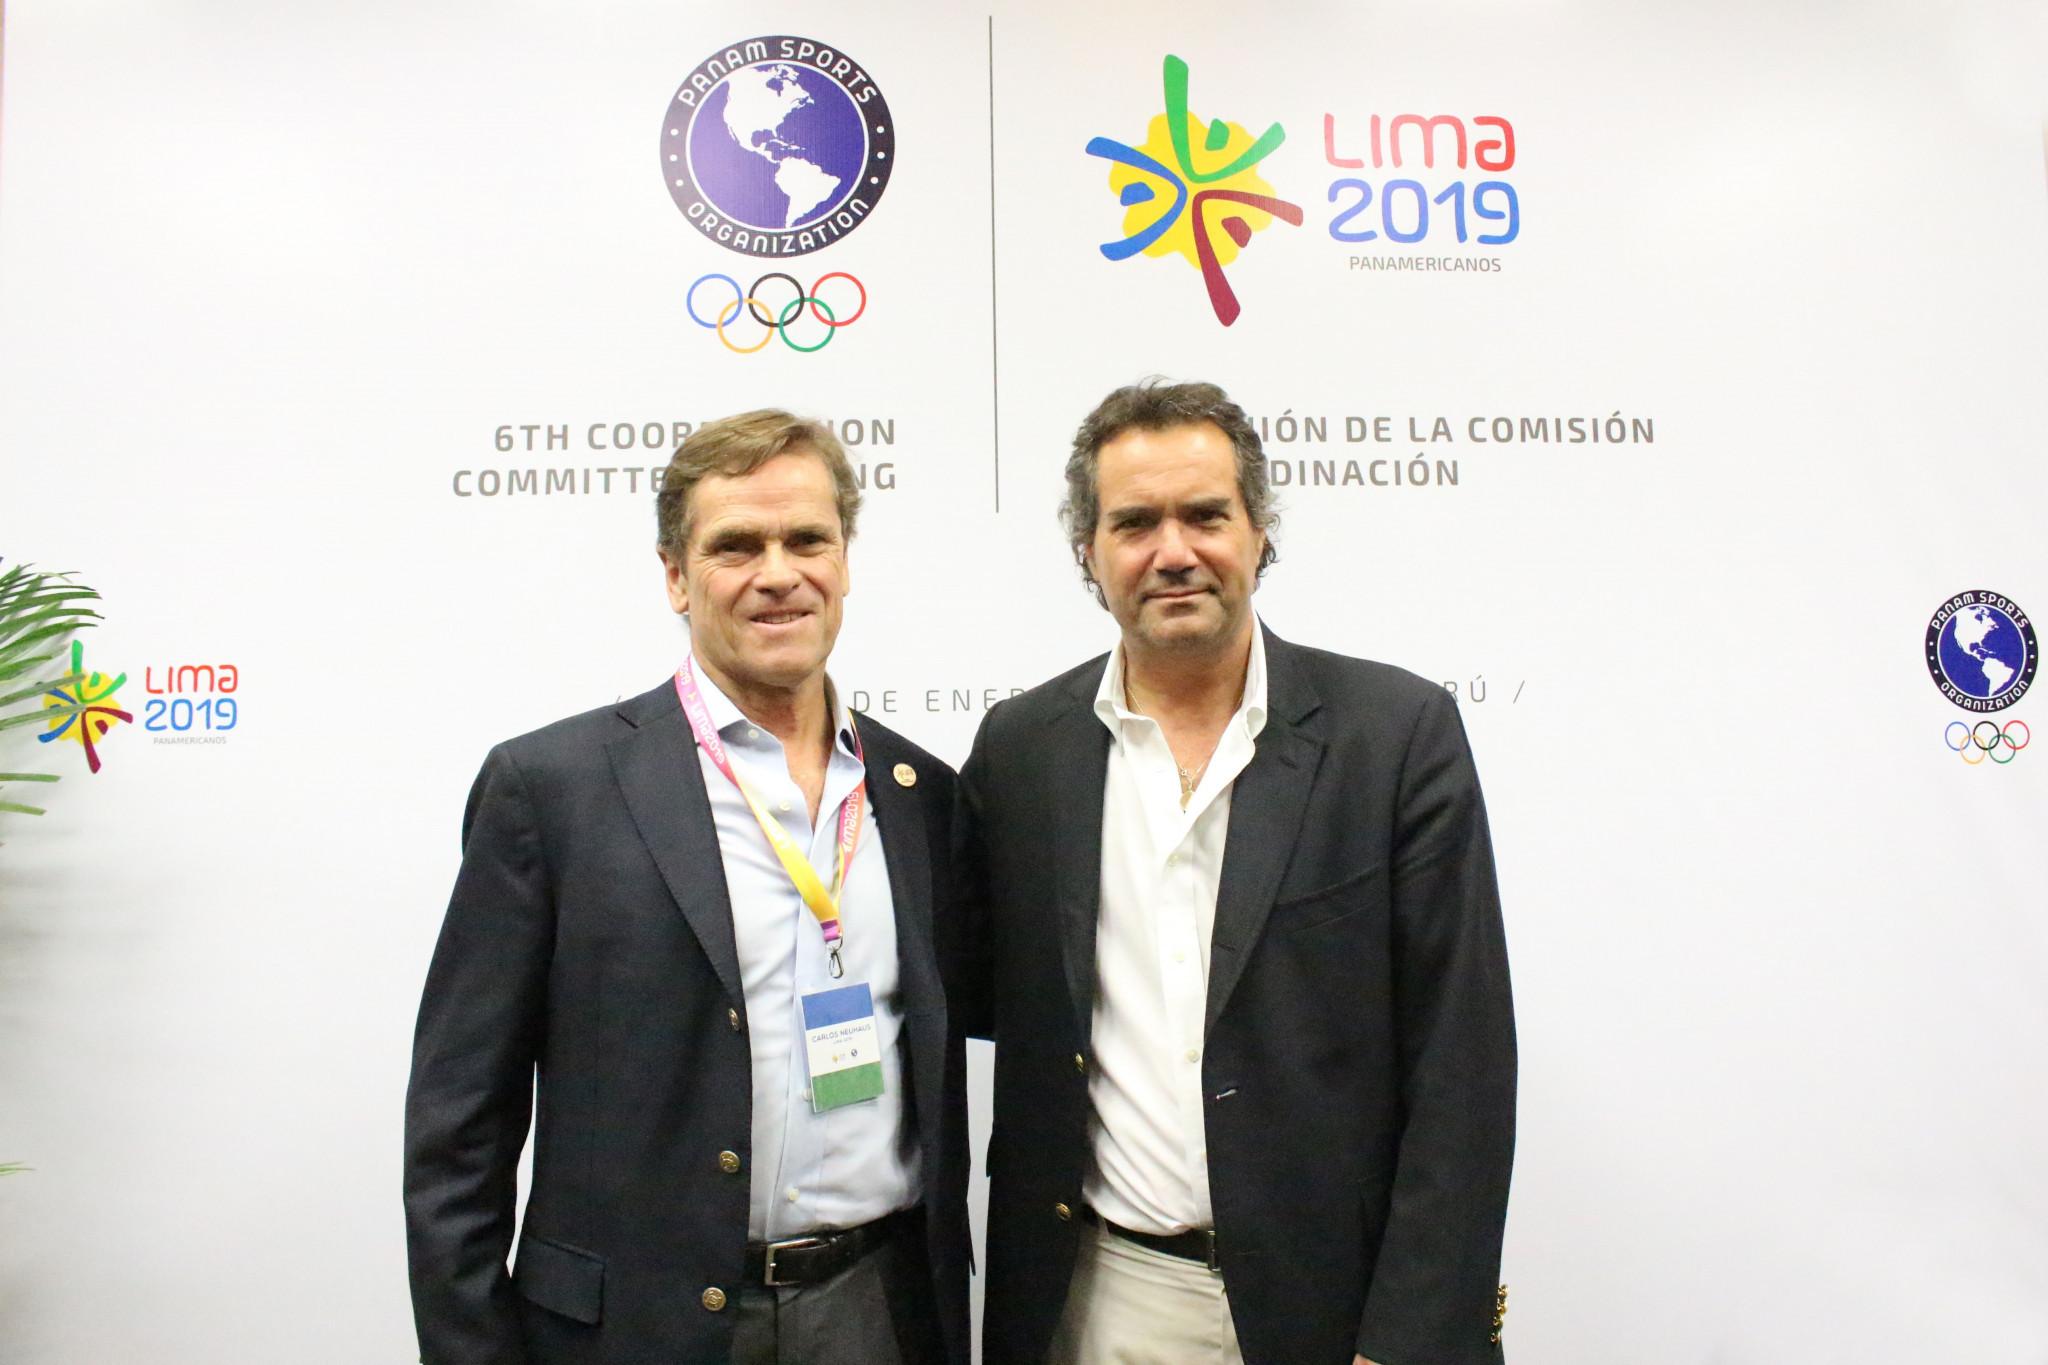 Lima 2019 President Carlos Neuhaus welcomed PanAmSports counterpart Neven Ilic on the visit ©Lima 2019